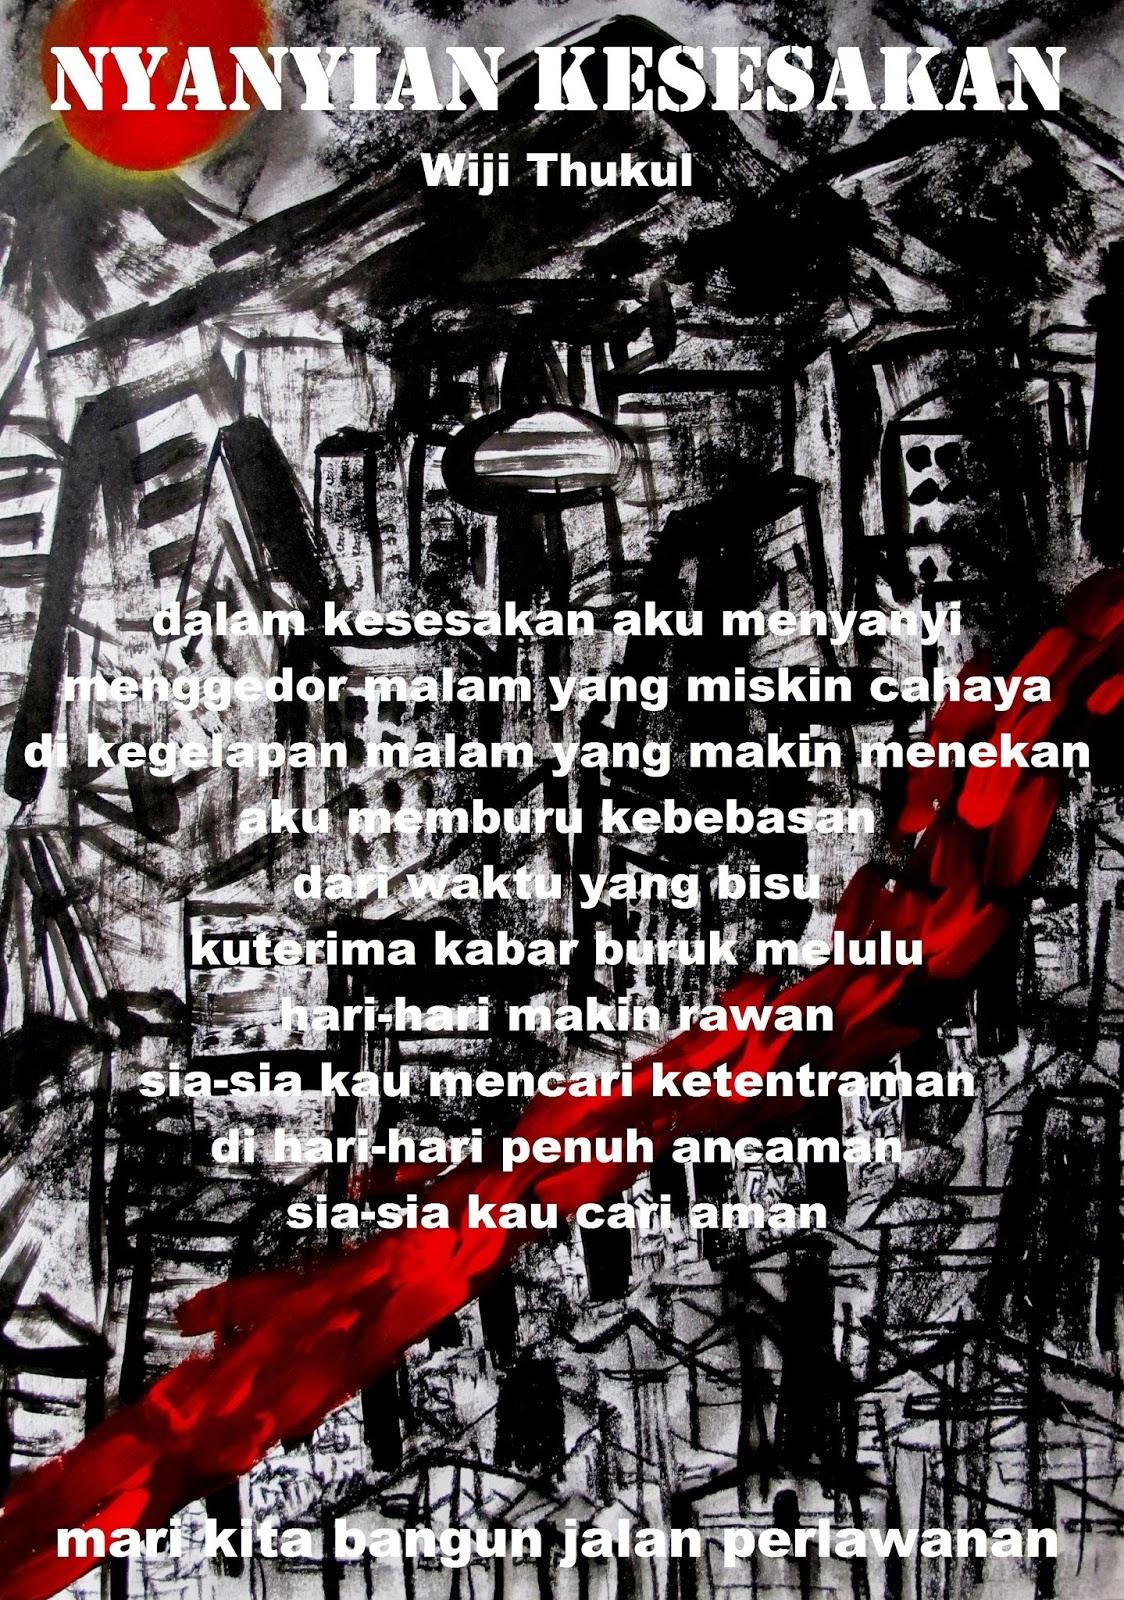 Nyanyian Kesesakan Puisi Puisi Wiji Thukul 35 Monumen